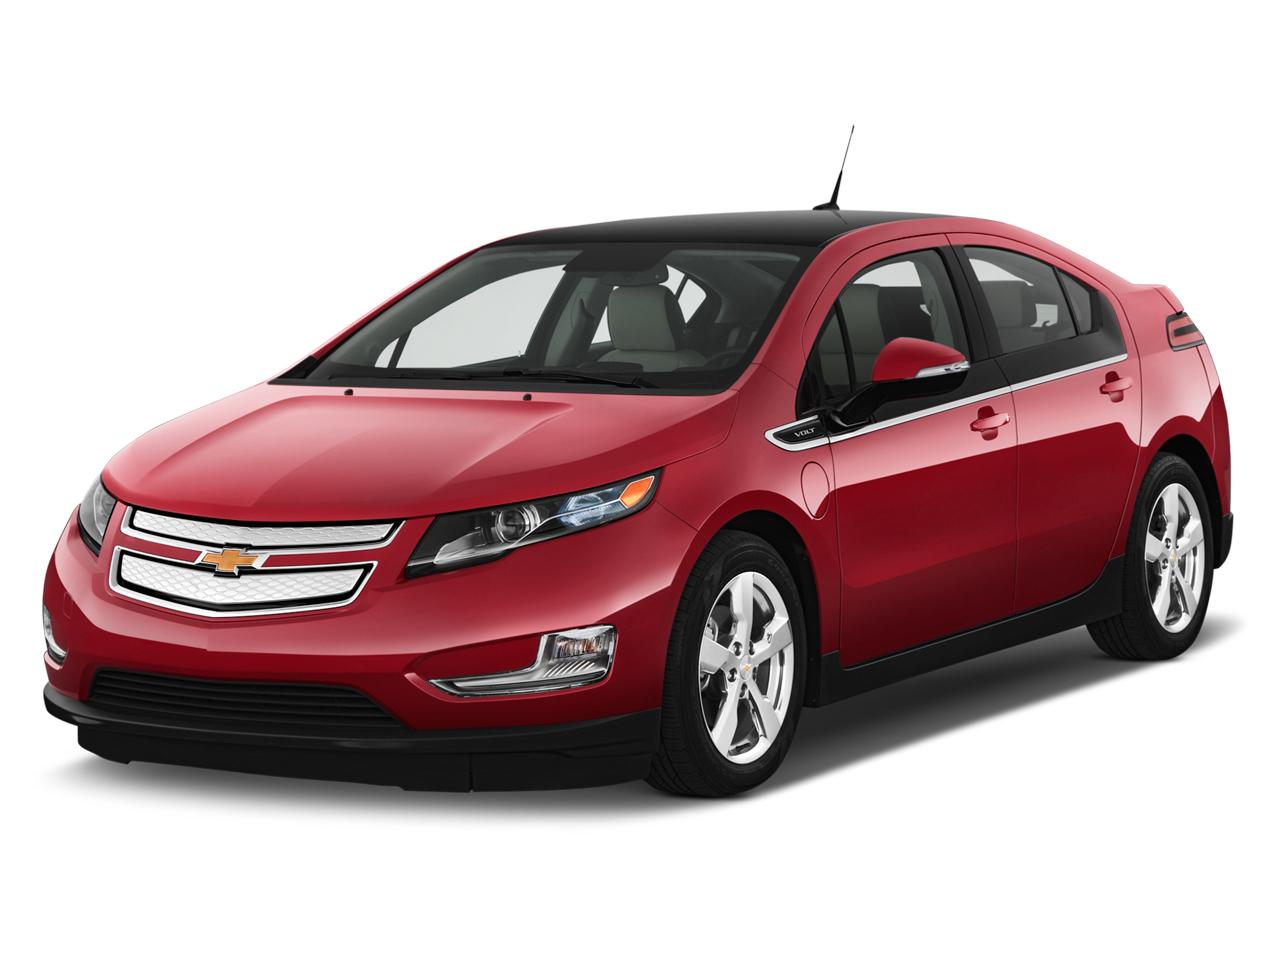 Kelebihan Chevrolet Volt 2012 Top Model Tahun Ini